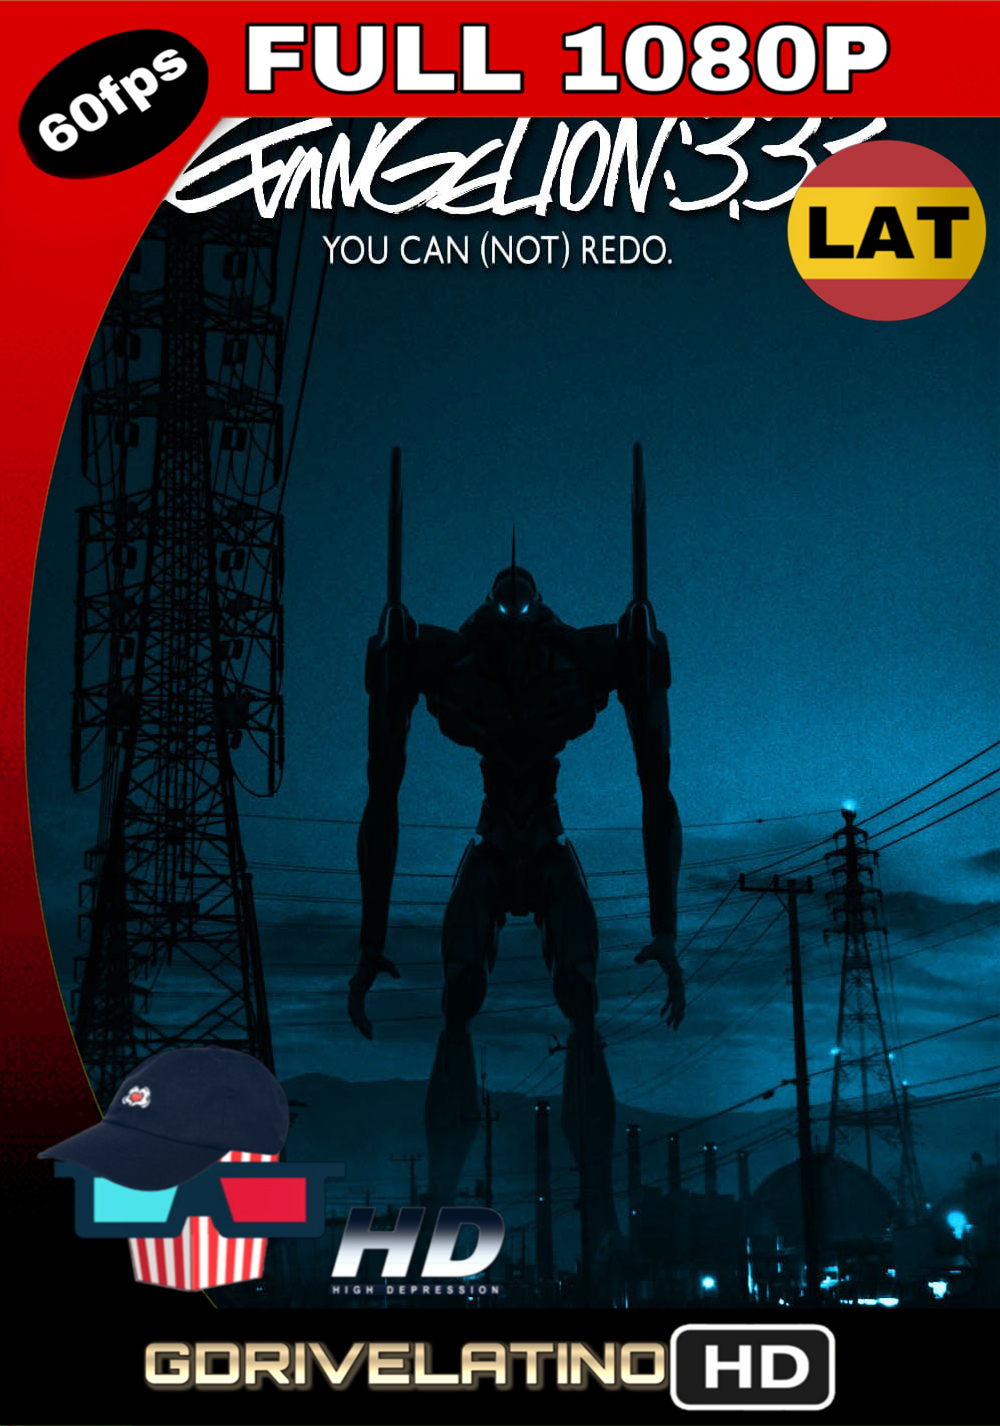 Evangelion: 3.33 (No) Lo Puedes Reahacer (2012) BDRip FULL 1080p (Latino – Japonés) MKV